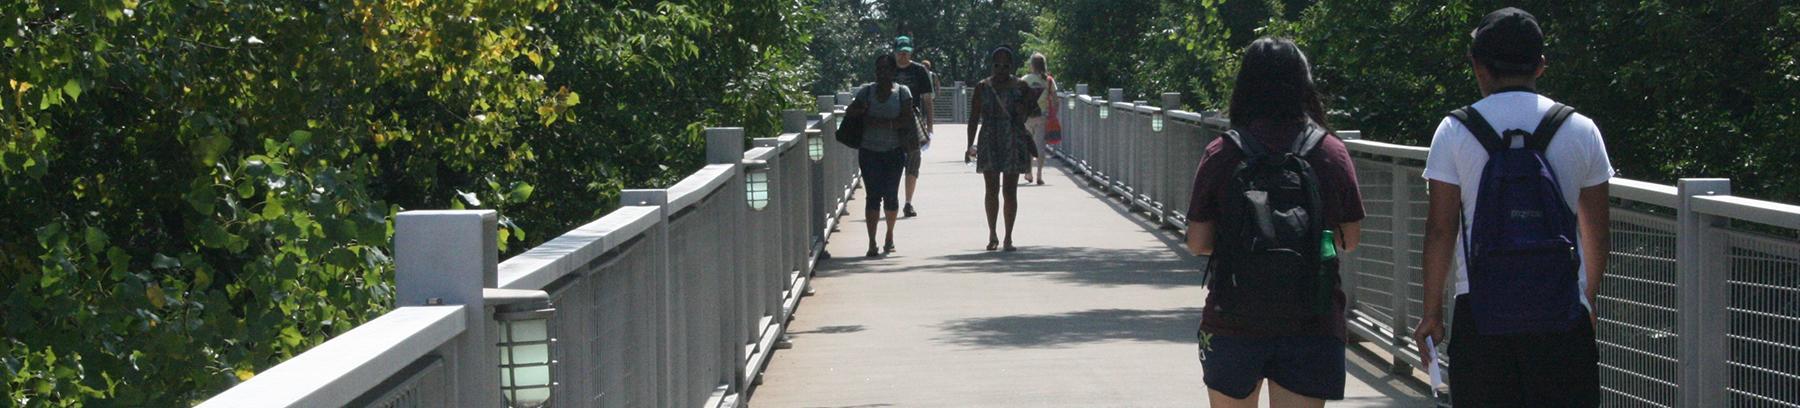 Students crossing the walking bridge at Century College.